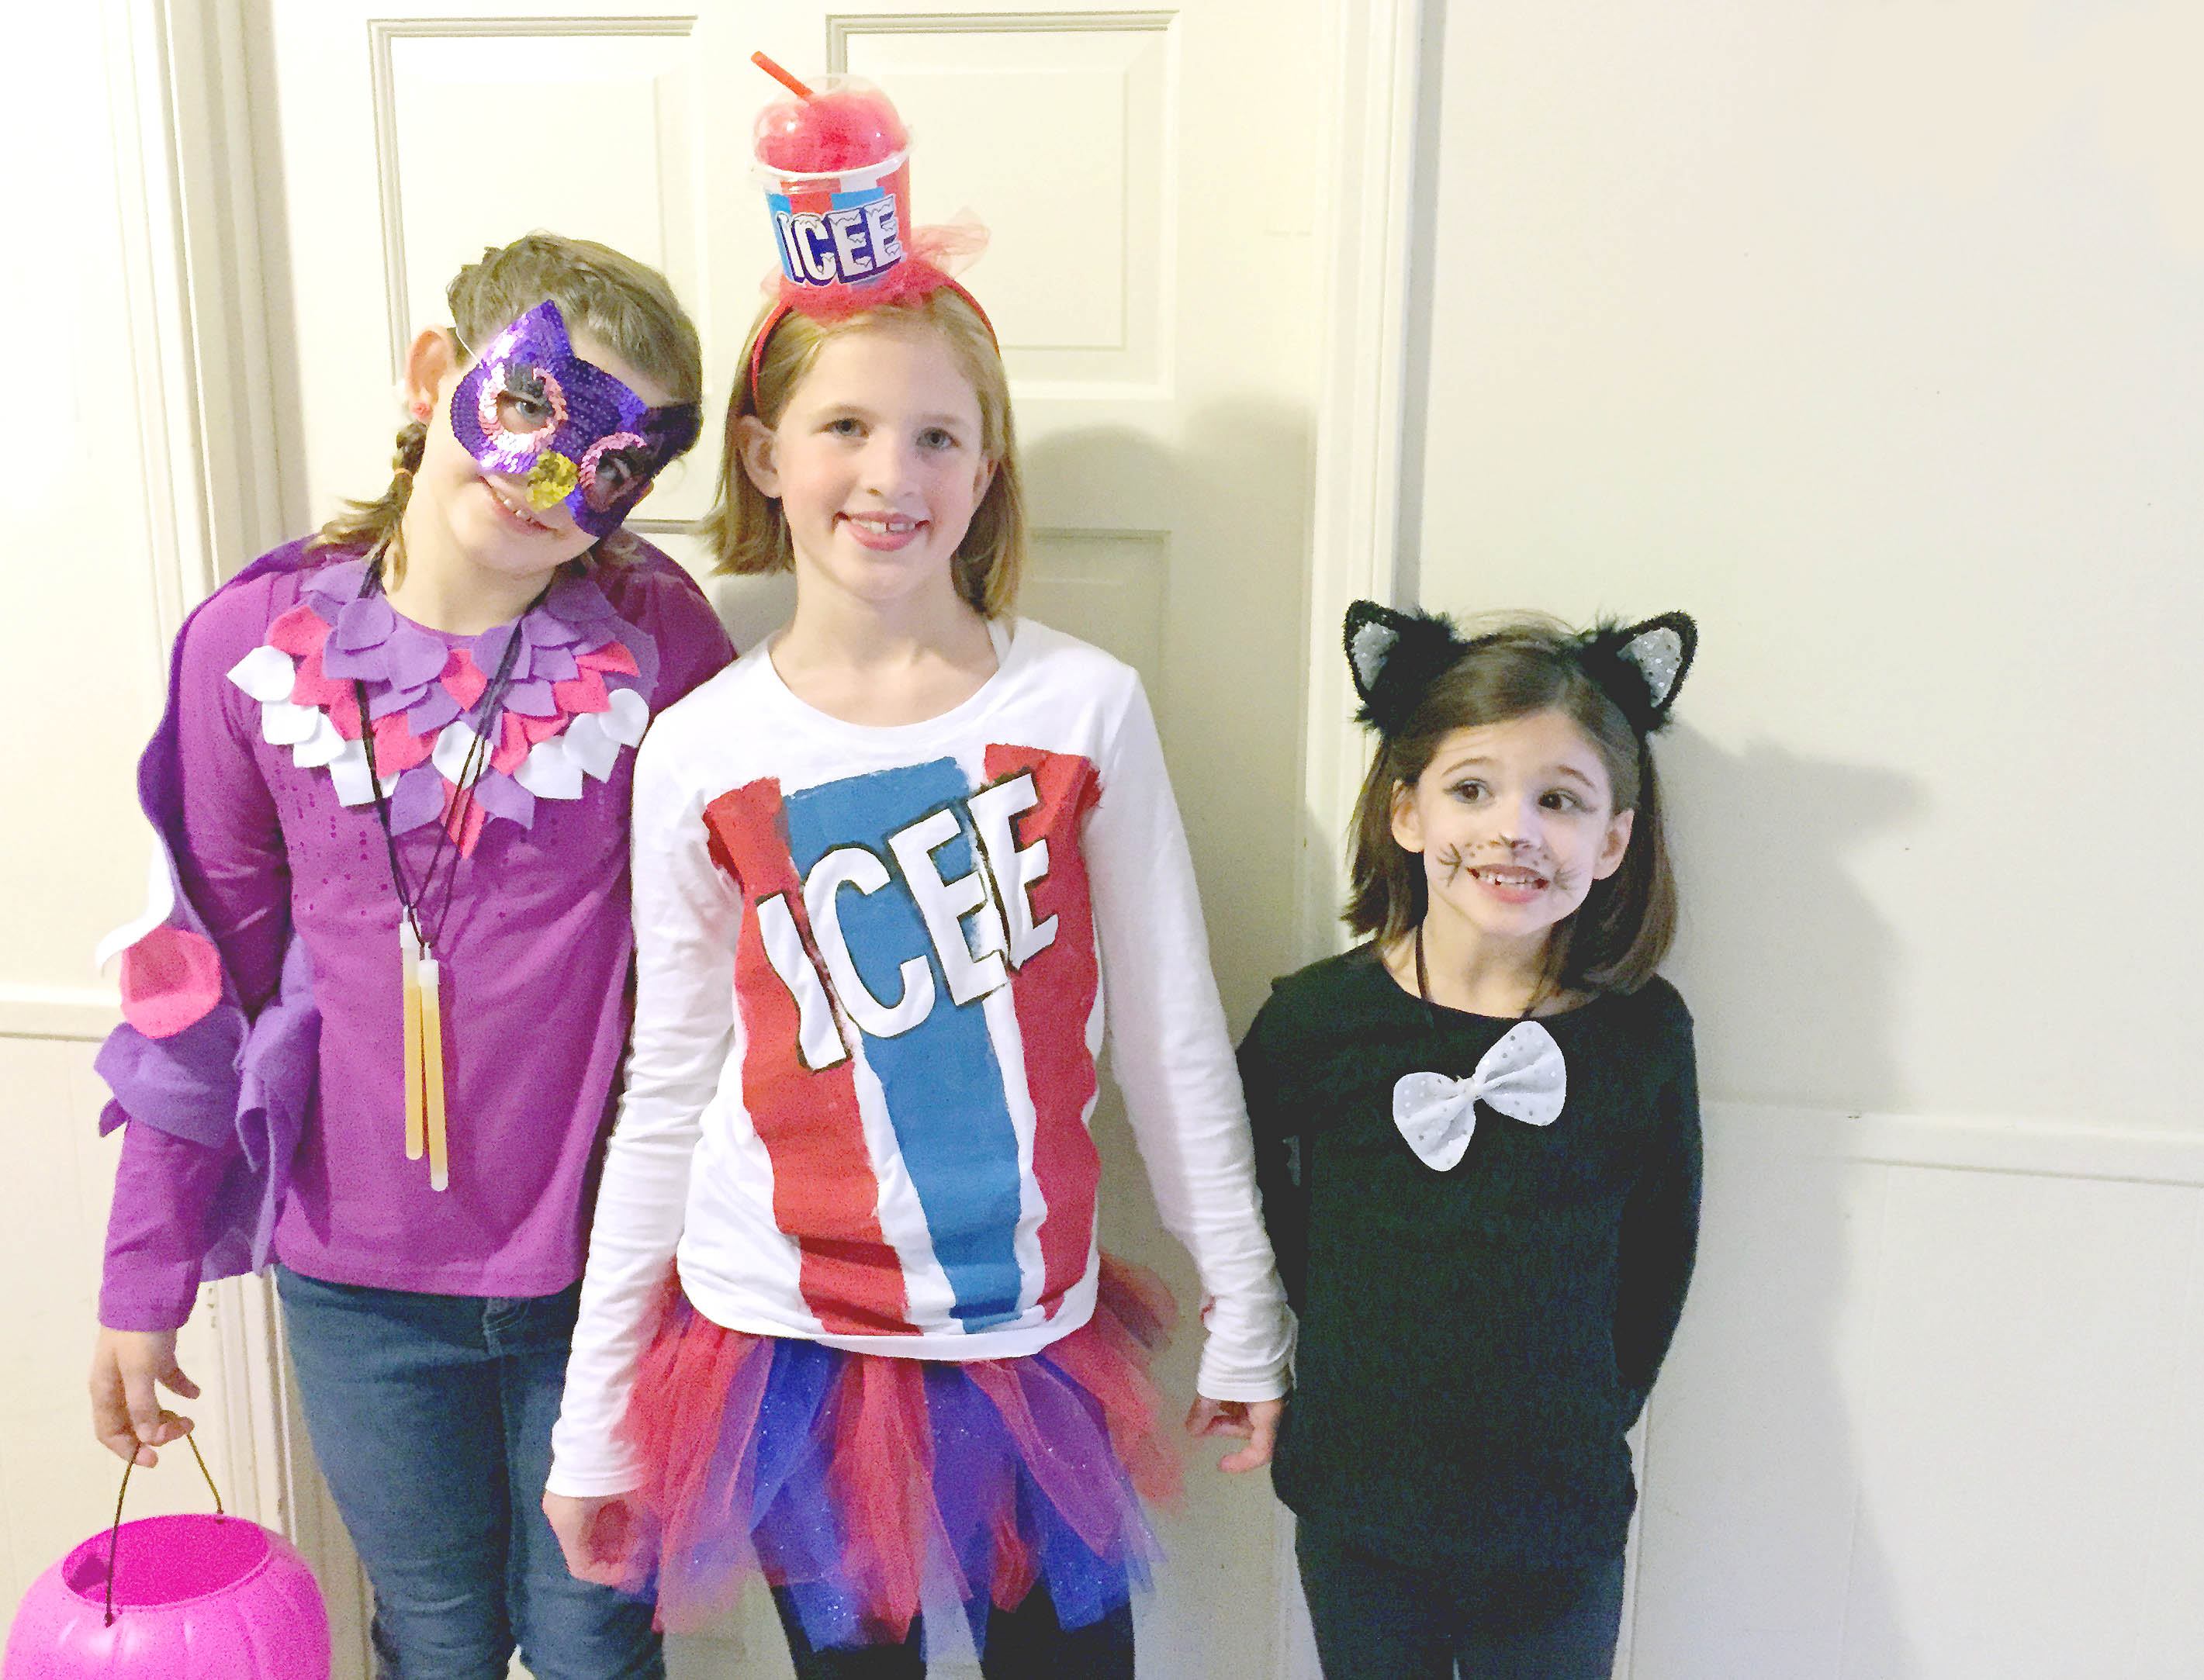 Icee costume